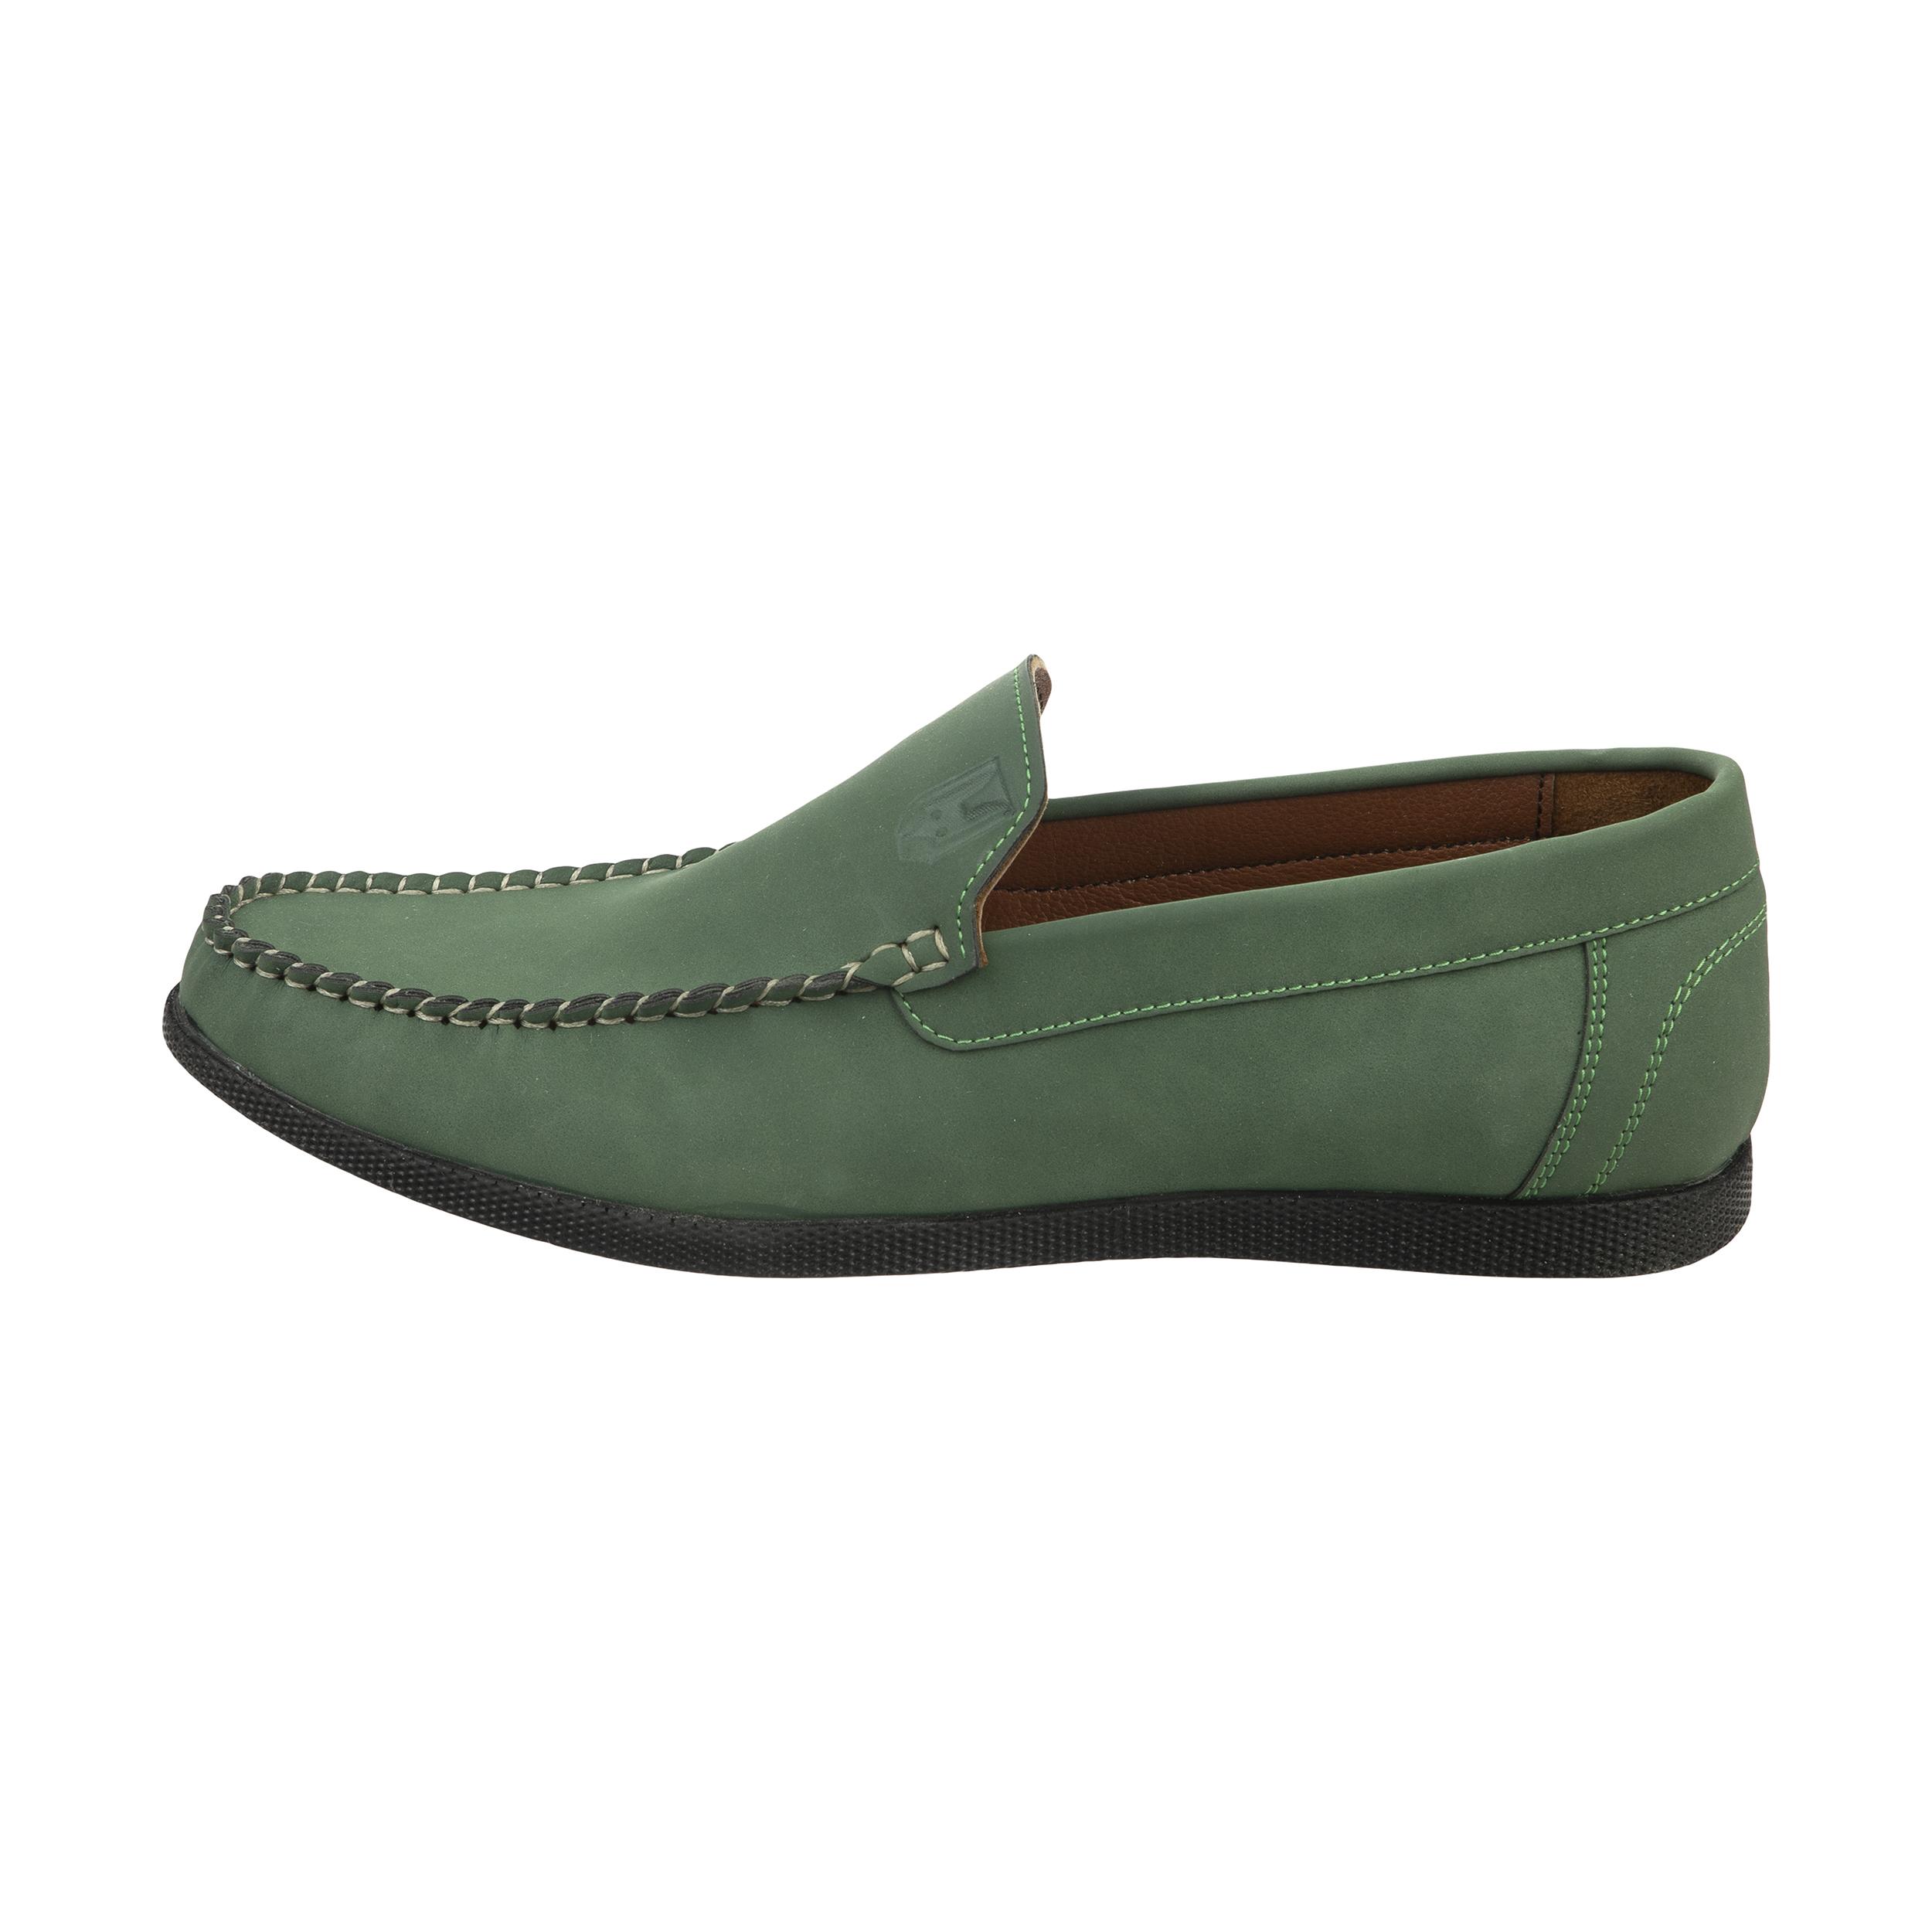 کفش روزمره مردانه مل اند موژ کد MC306-46N-1